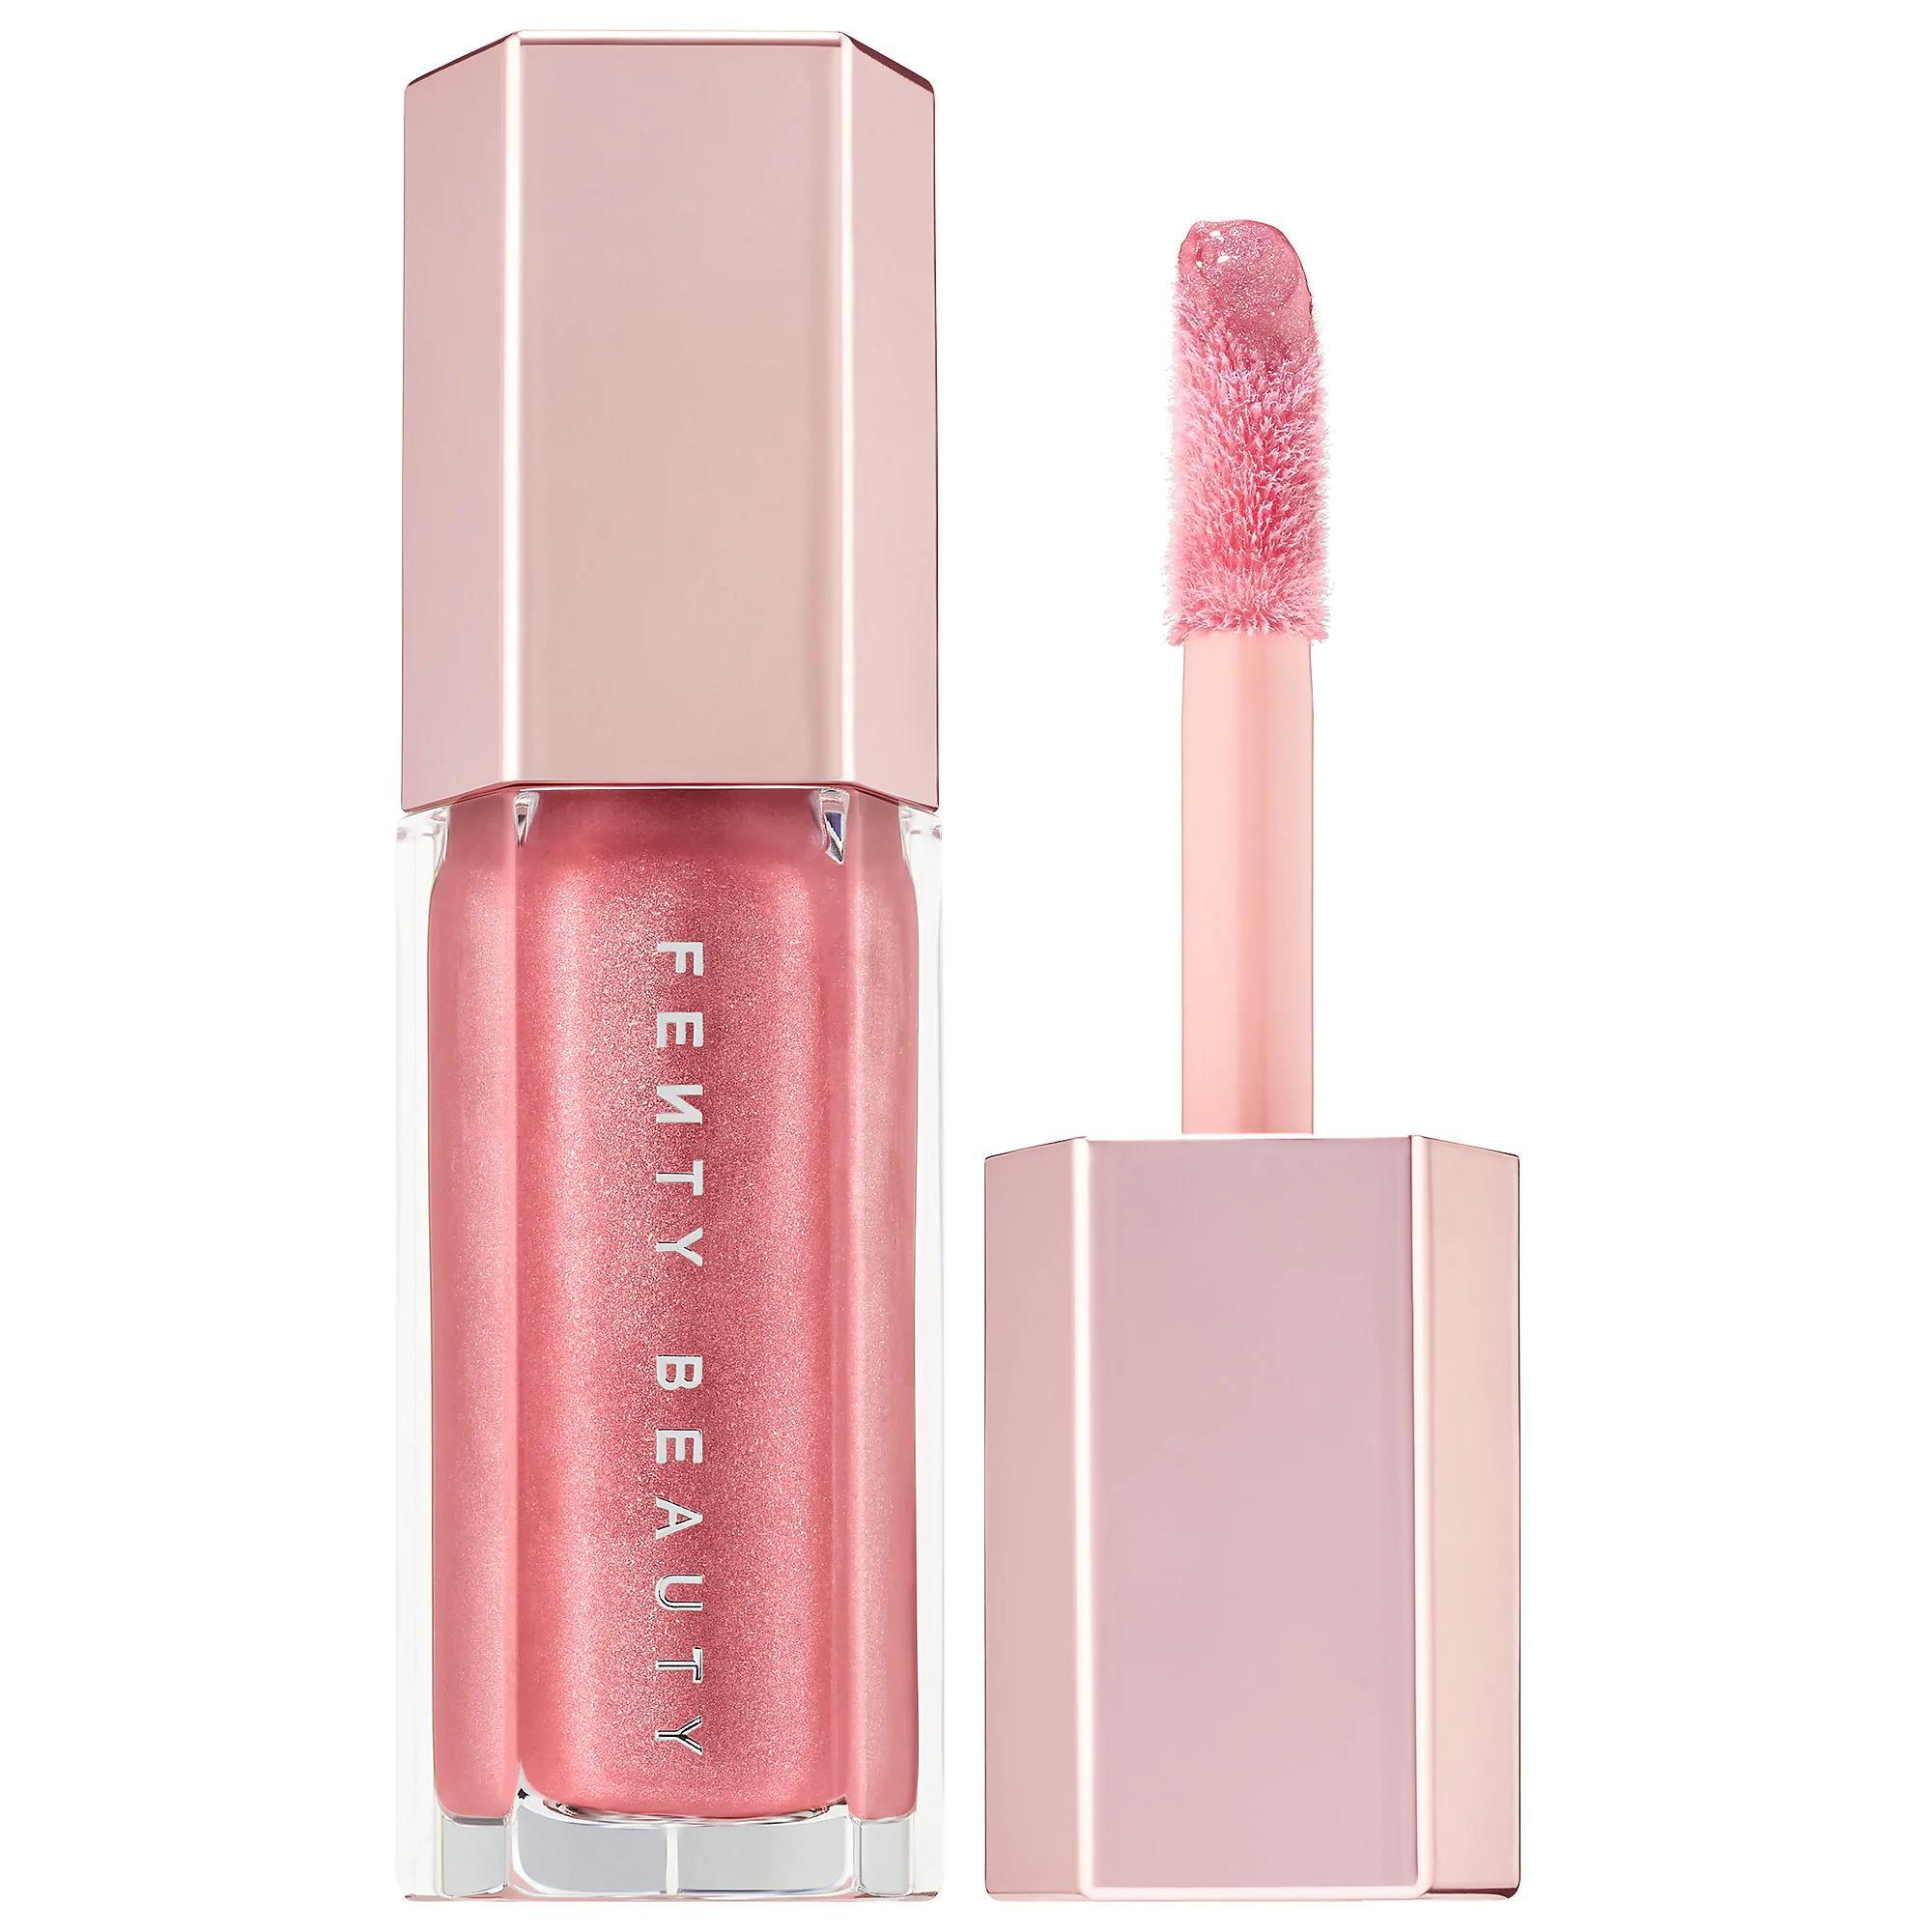 Fenty Gloss Bomb Universal Lip Luminizer Fu$$y